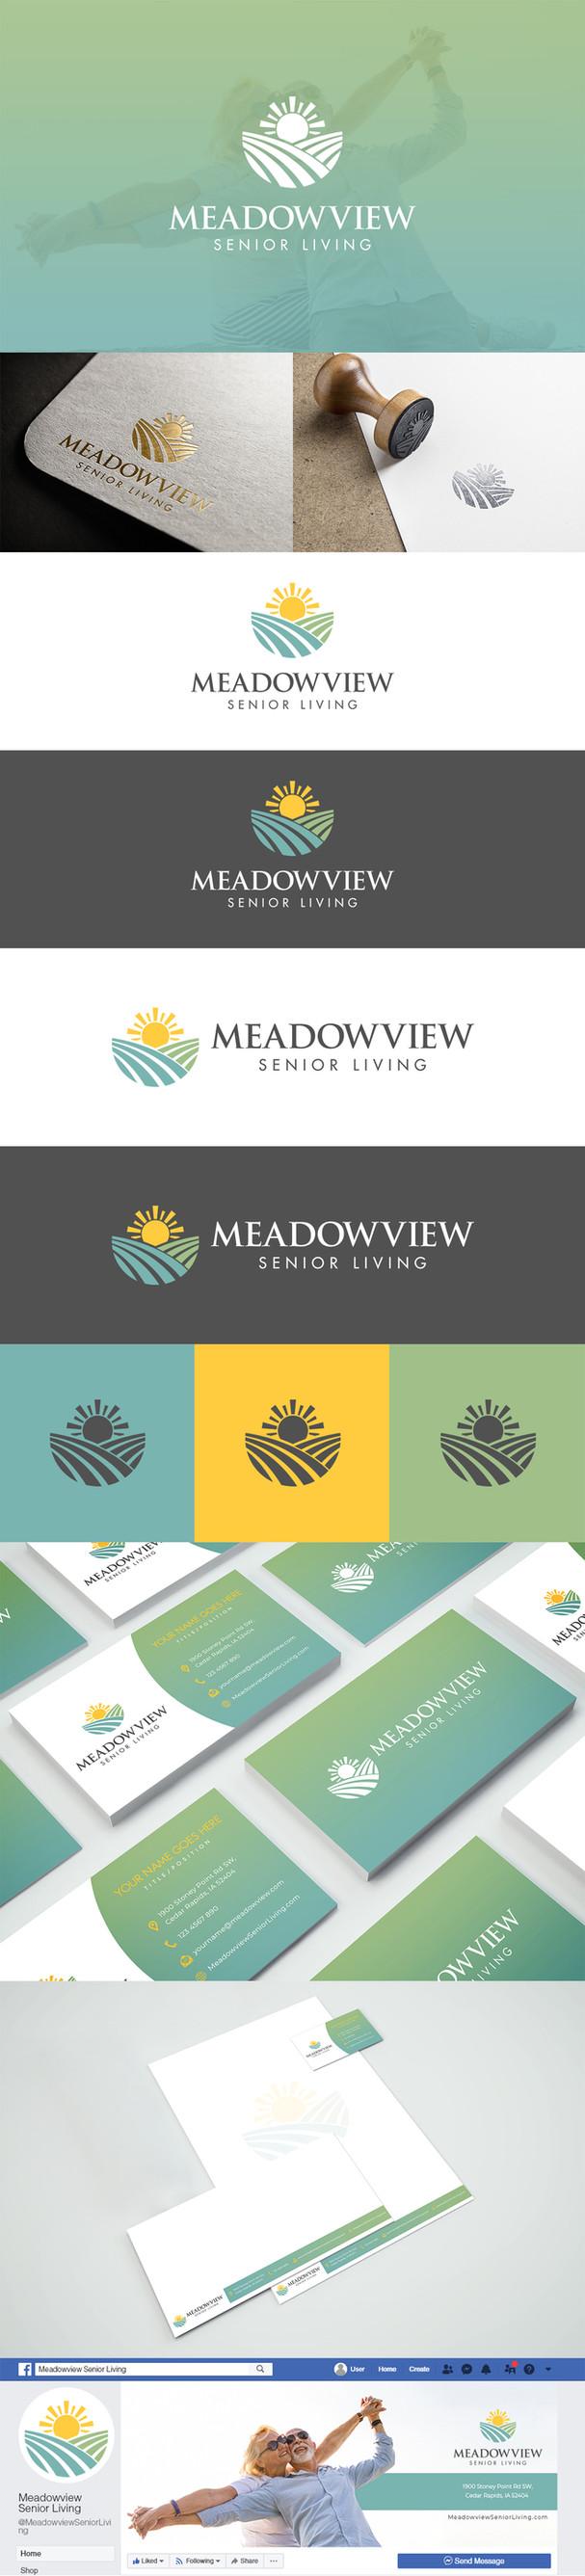 Meadowview Senior Living Logo Design & B